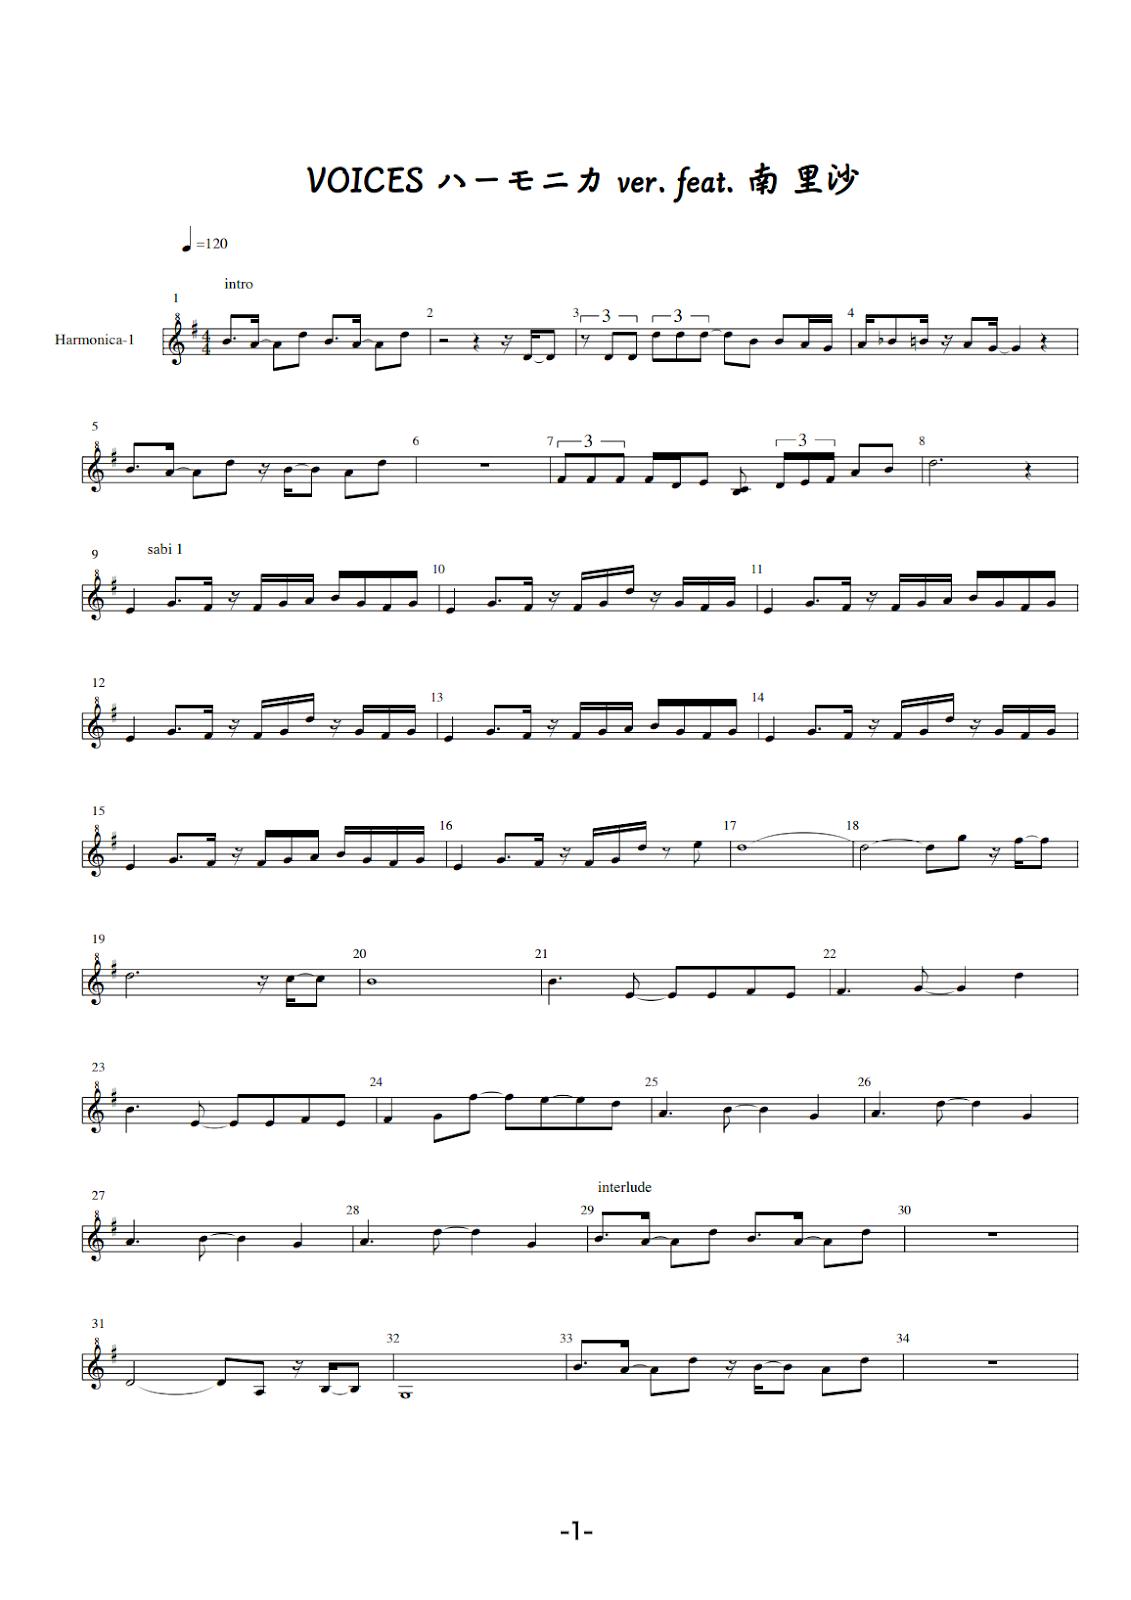 VOICES ハーモニカ ver. feat. 南 里沙の楽譜の一枚目